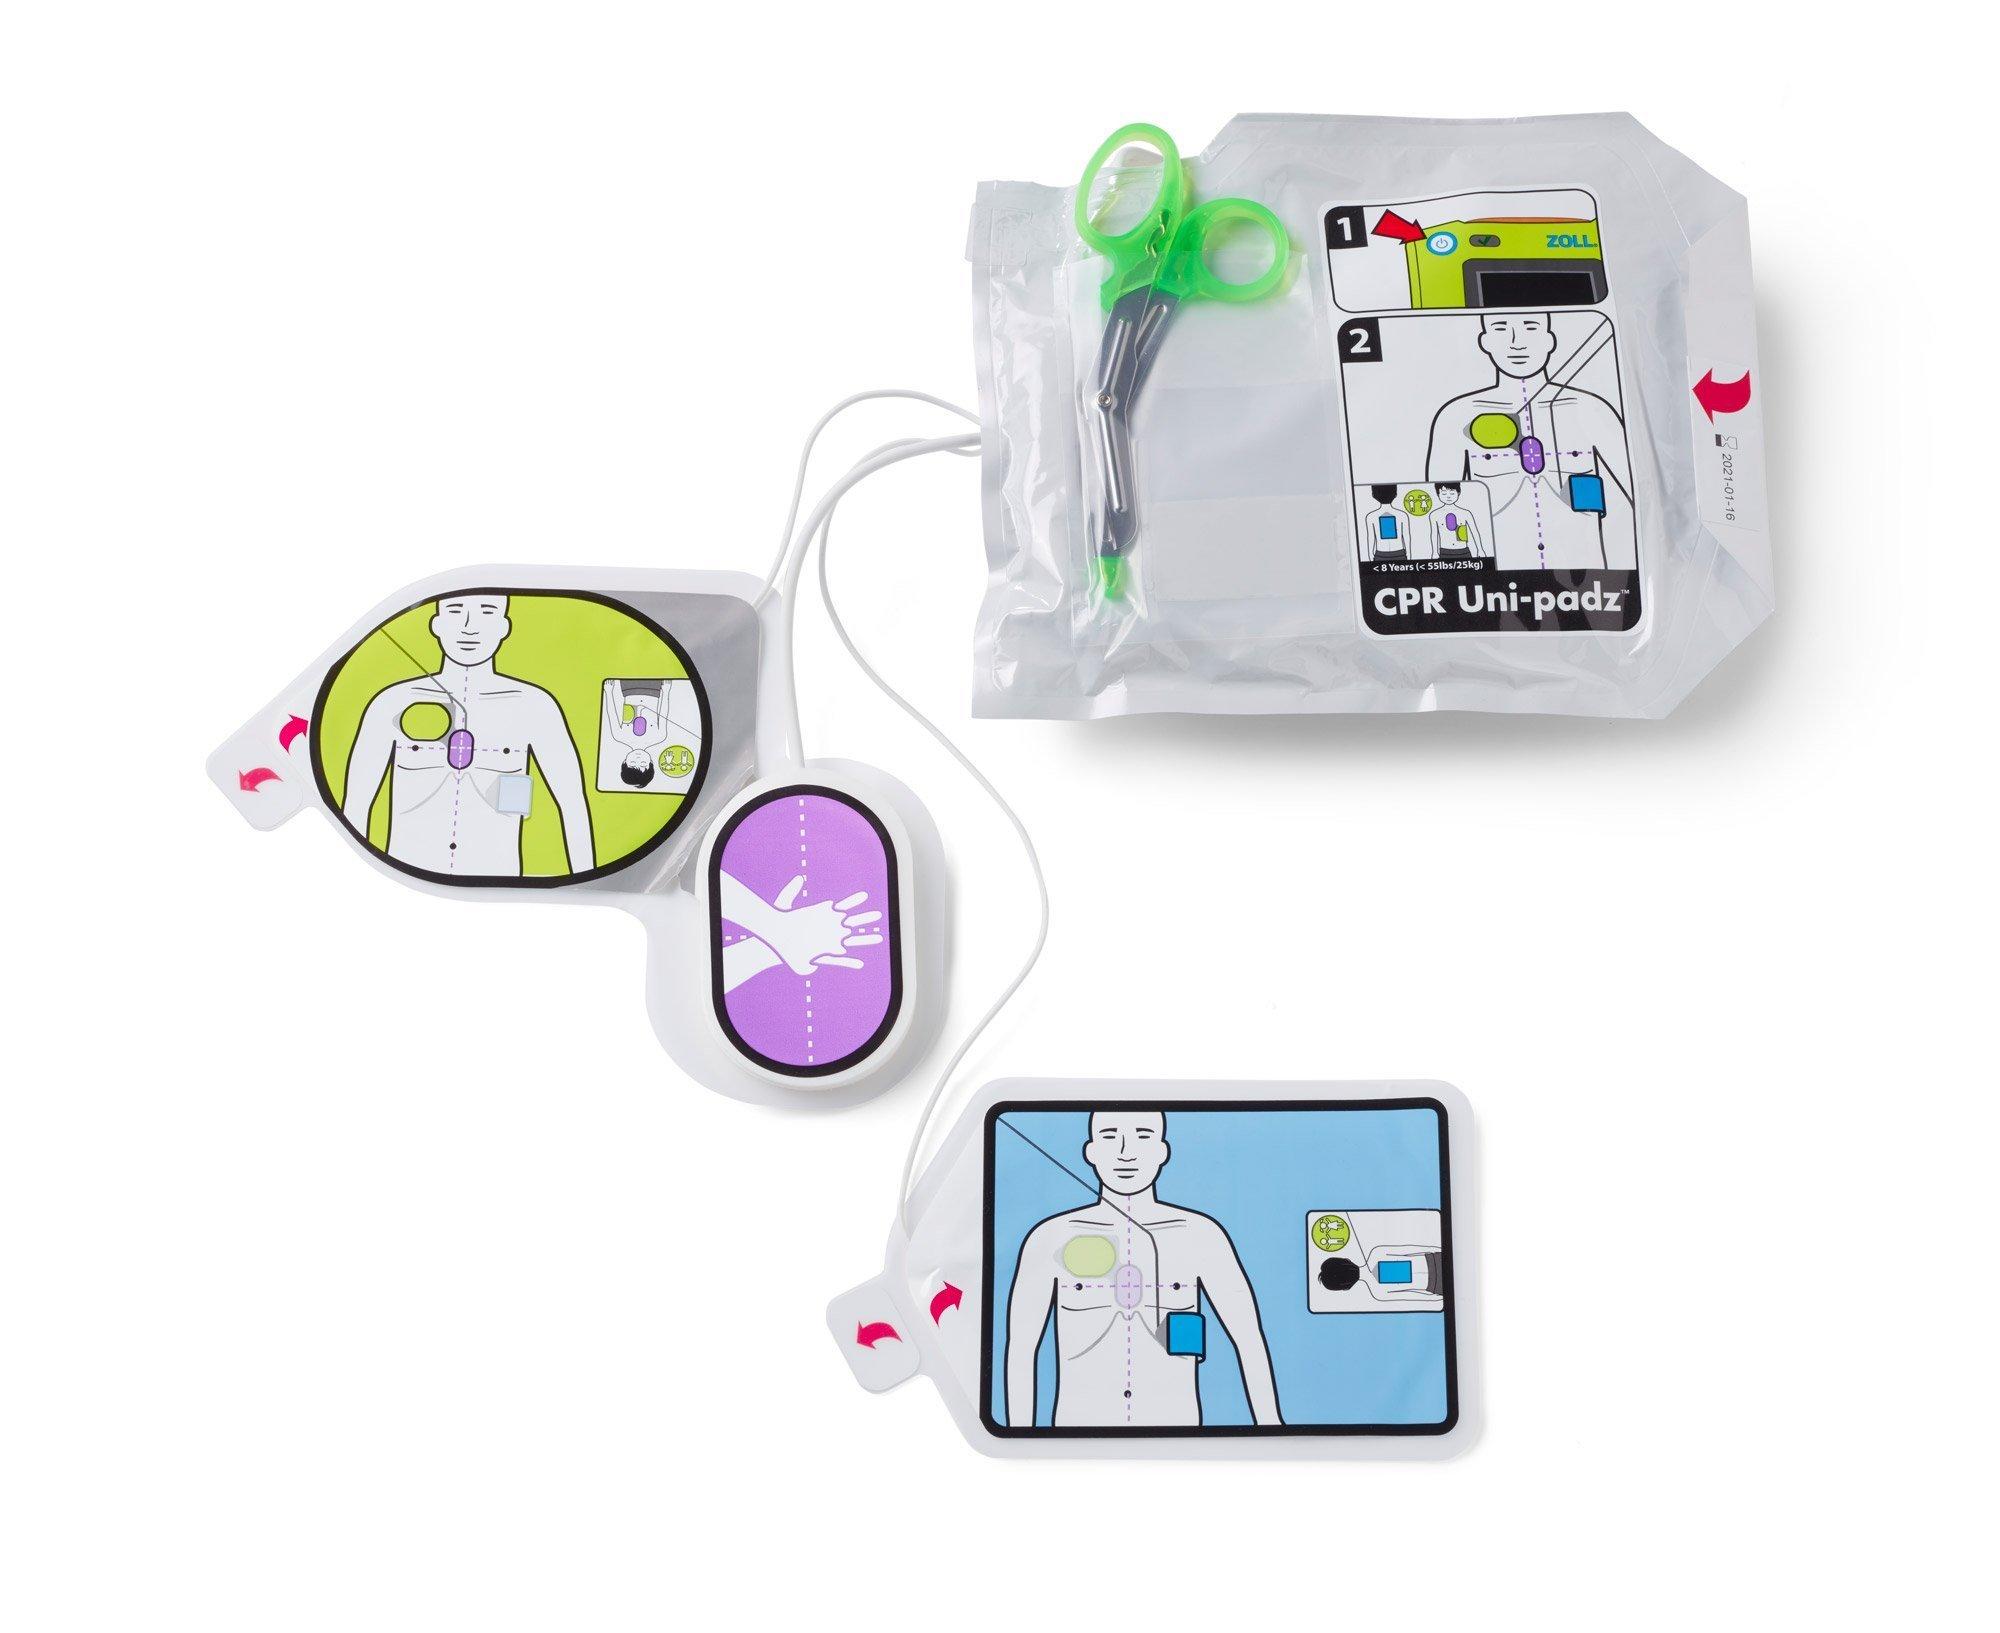 CPR Uni-Padz